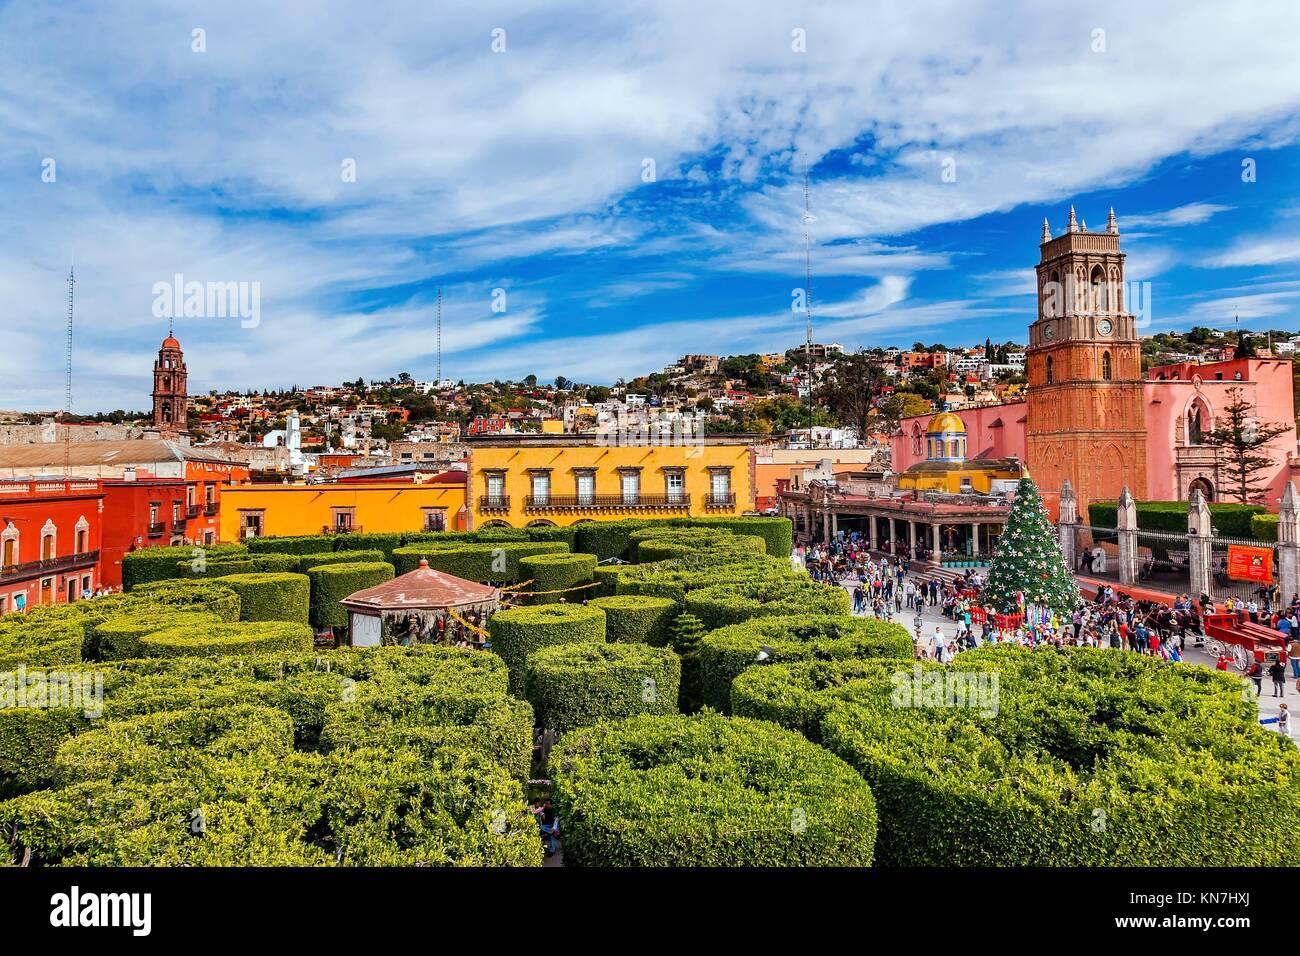 Parroquia Archangel church Greeb Jardin Town Square San Miguel de Allende, Mexico. Parroaguia created in 1600s. - Stock Image